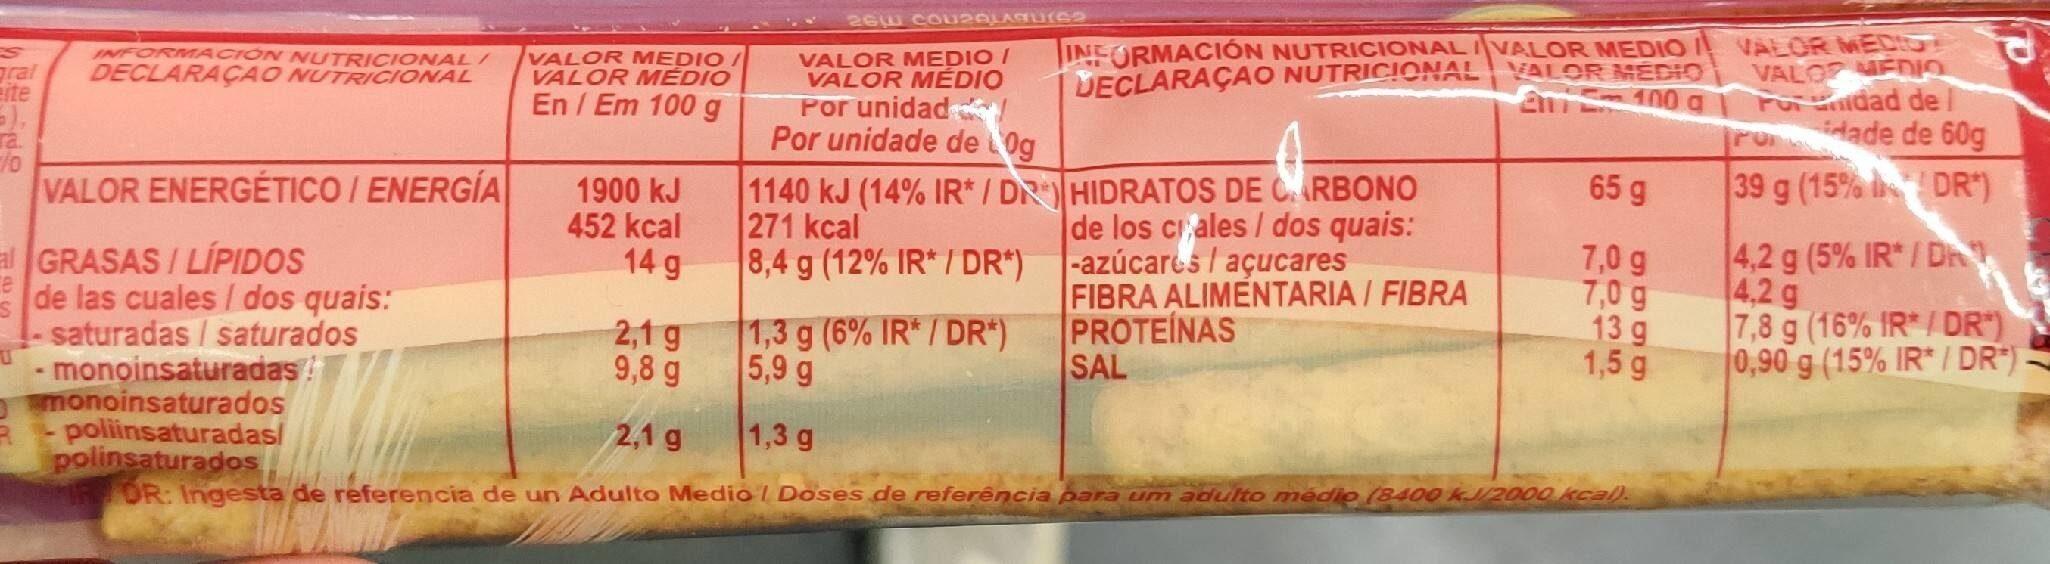 Silueta palitos de pan integrales - Información nutricional - fr